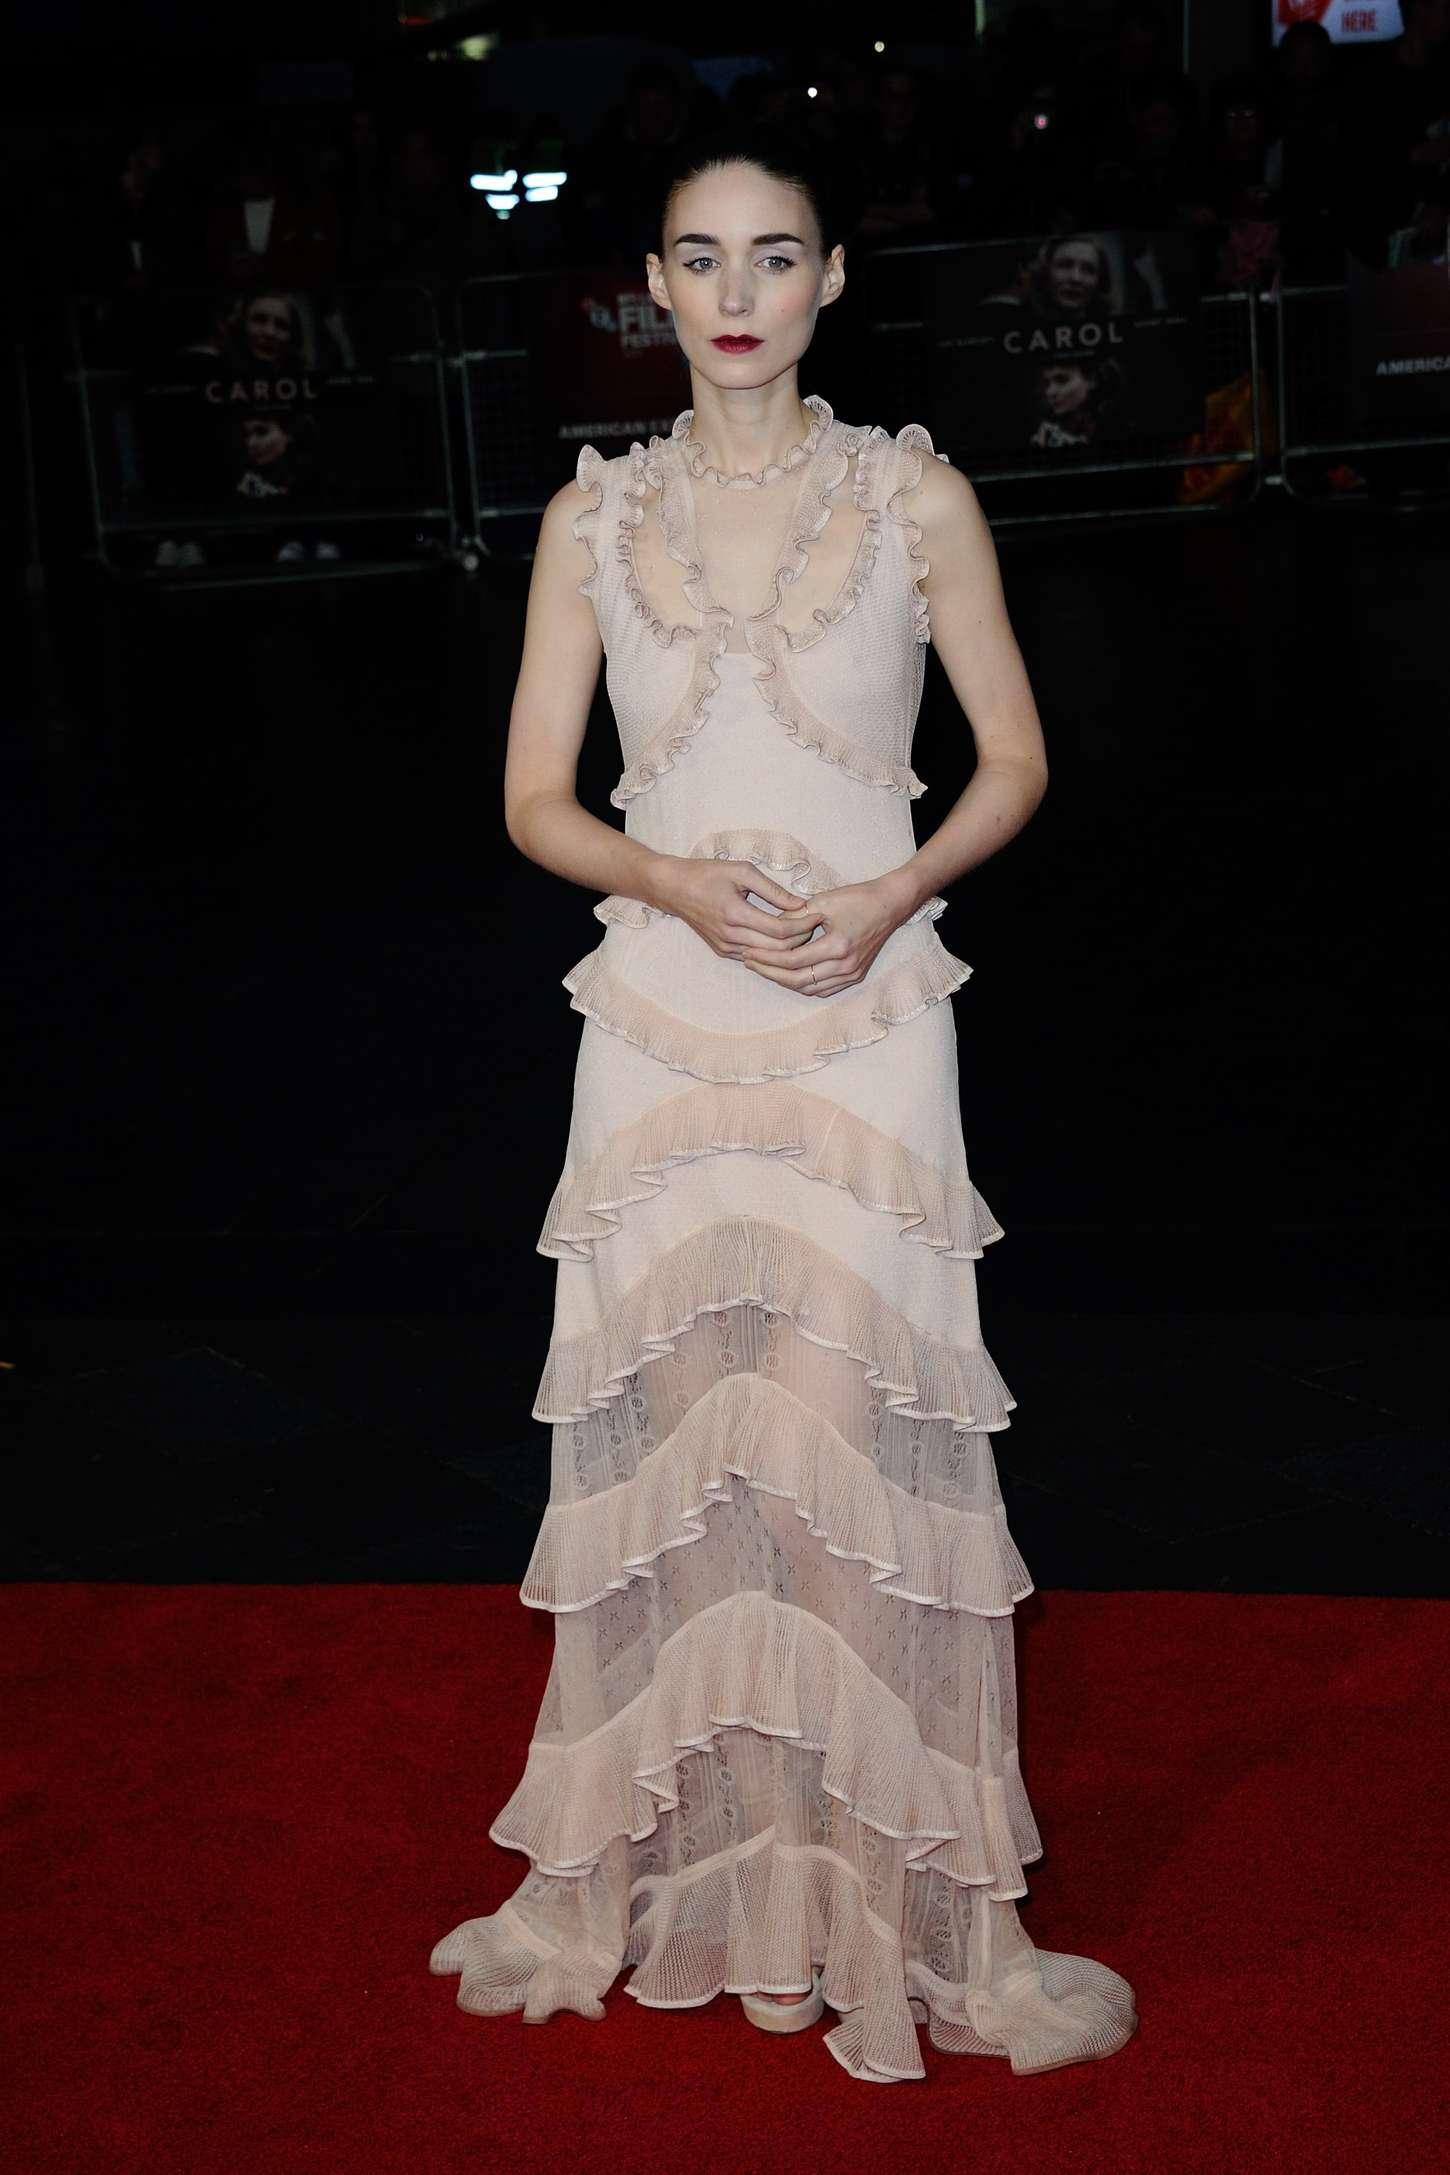 Rooney Mara 2015 : Rooney Mara: Carol Screening -16